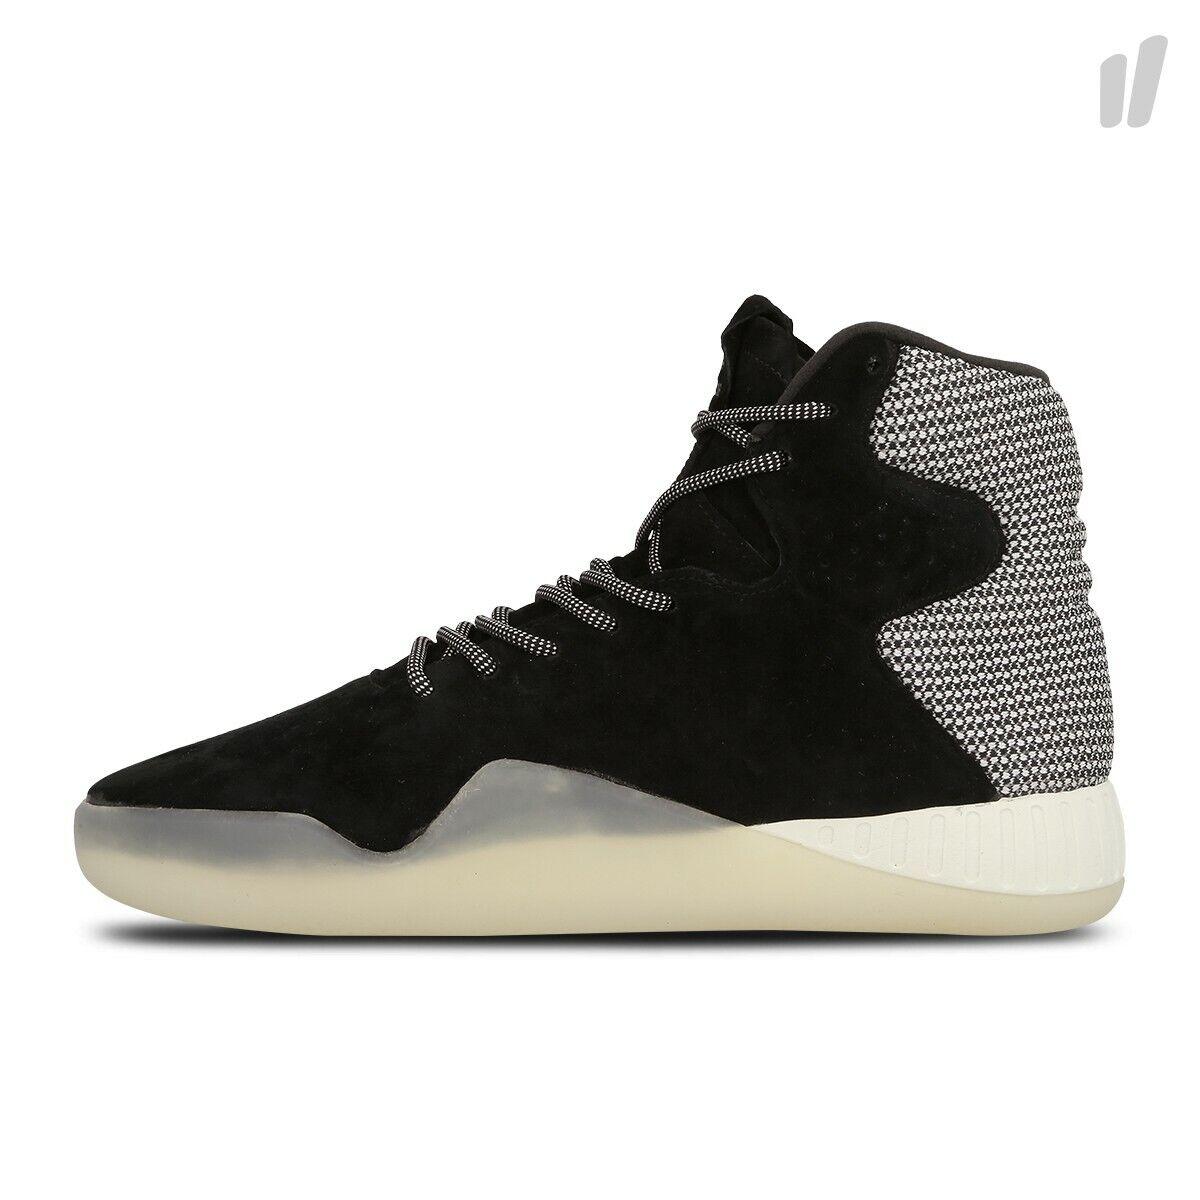 Adidas Originals Tubular Instinct Zapatillas para hombre UK 8 nos 8.5 EUR 42 ref 4254